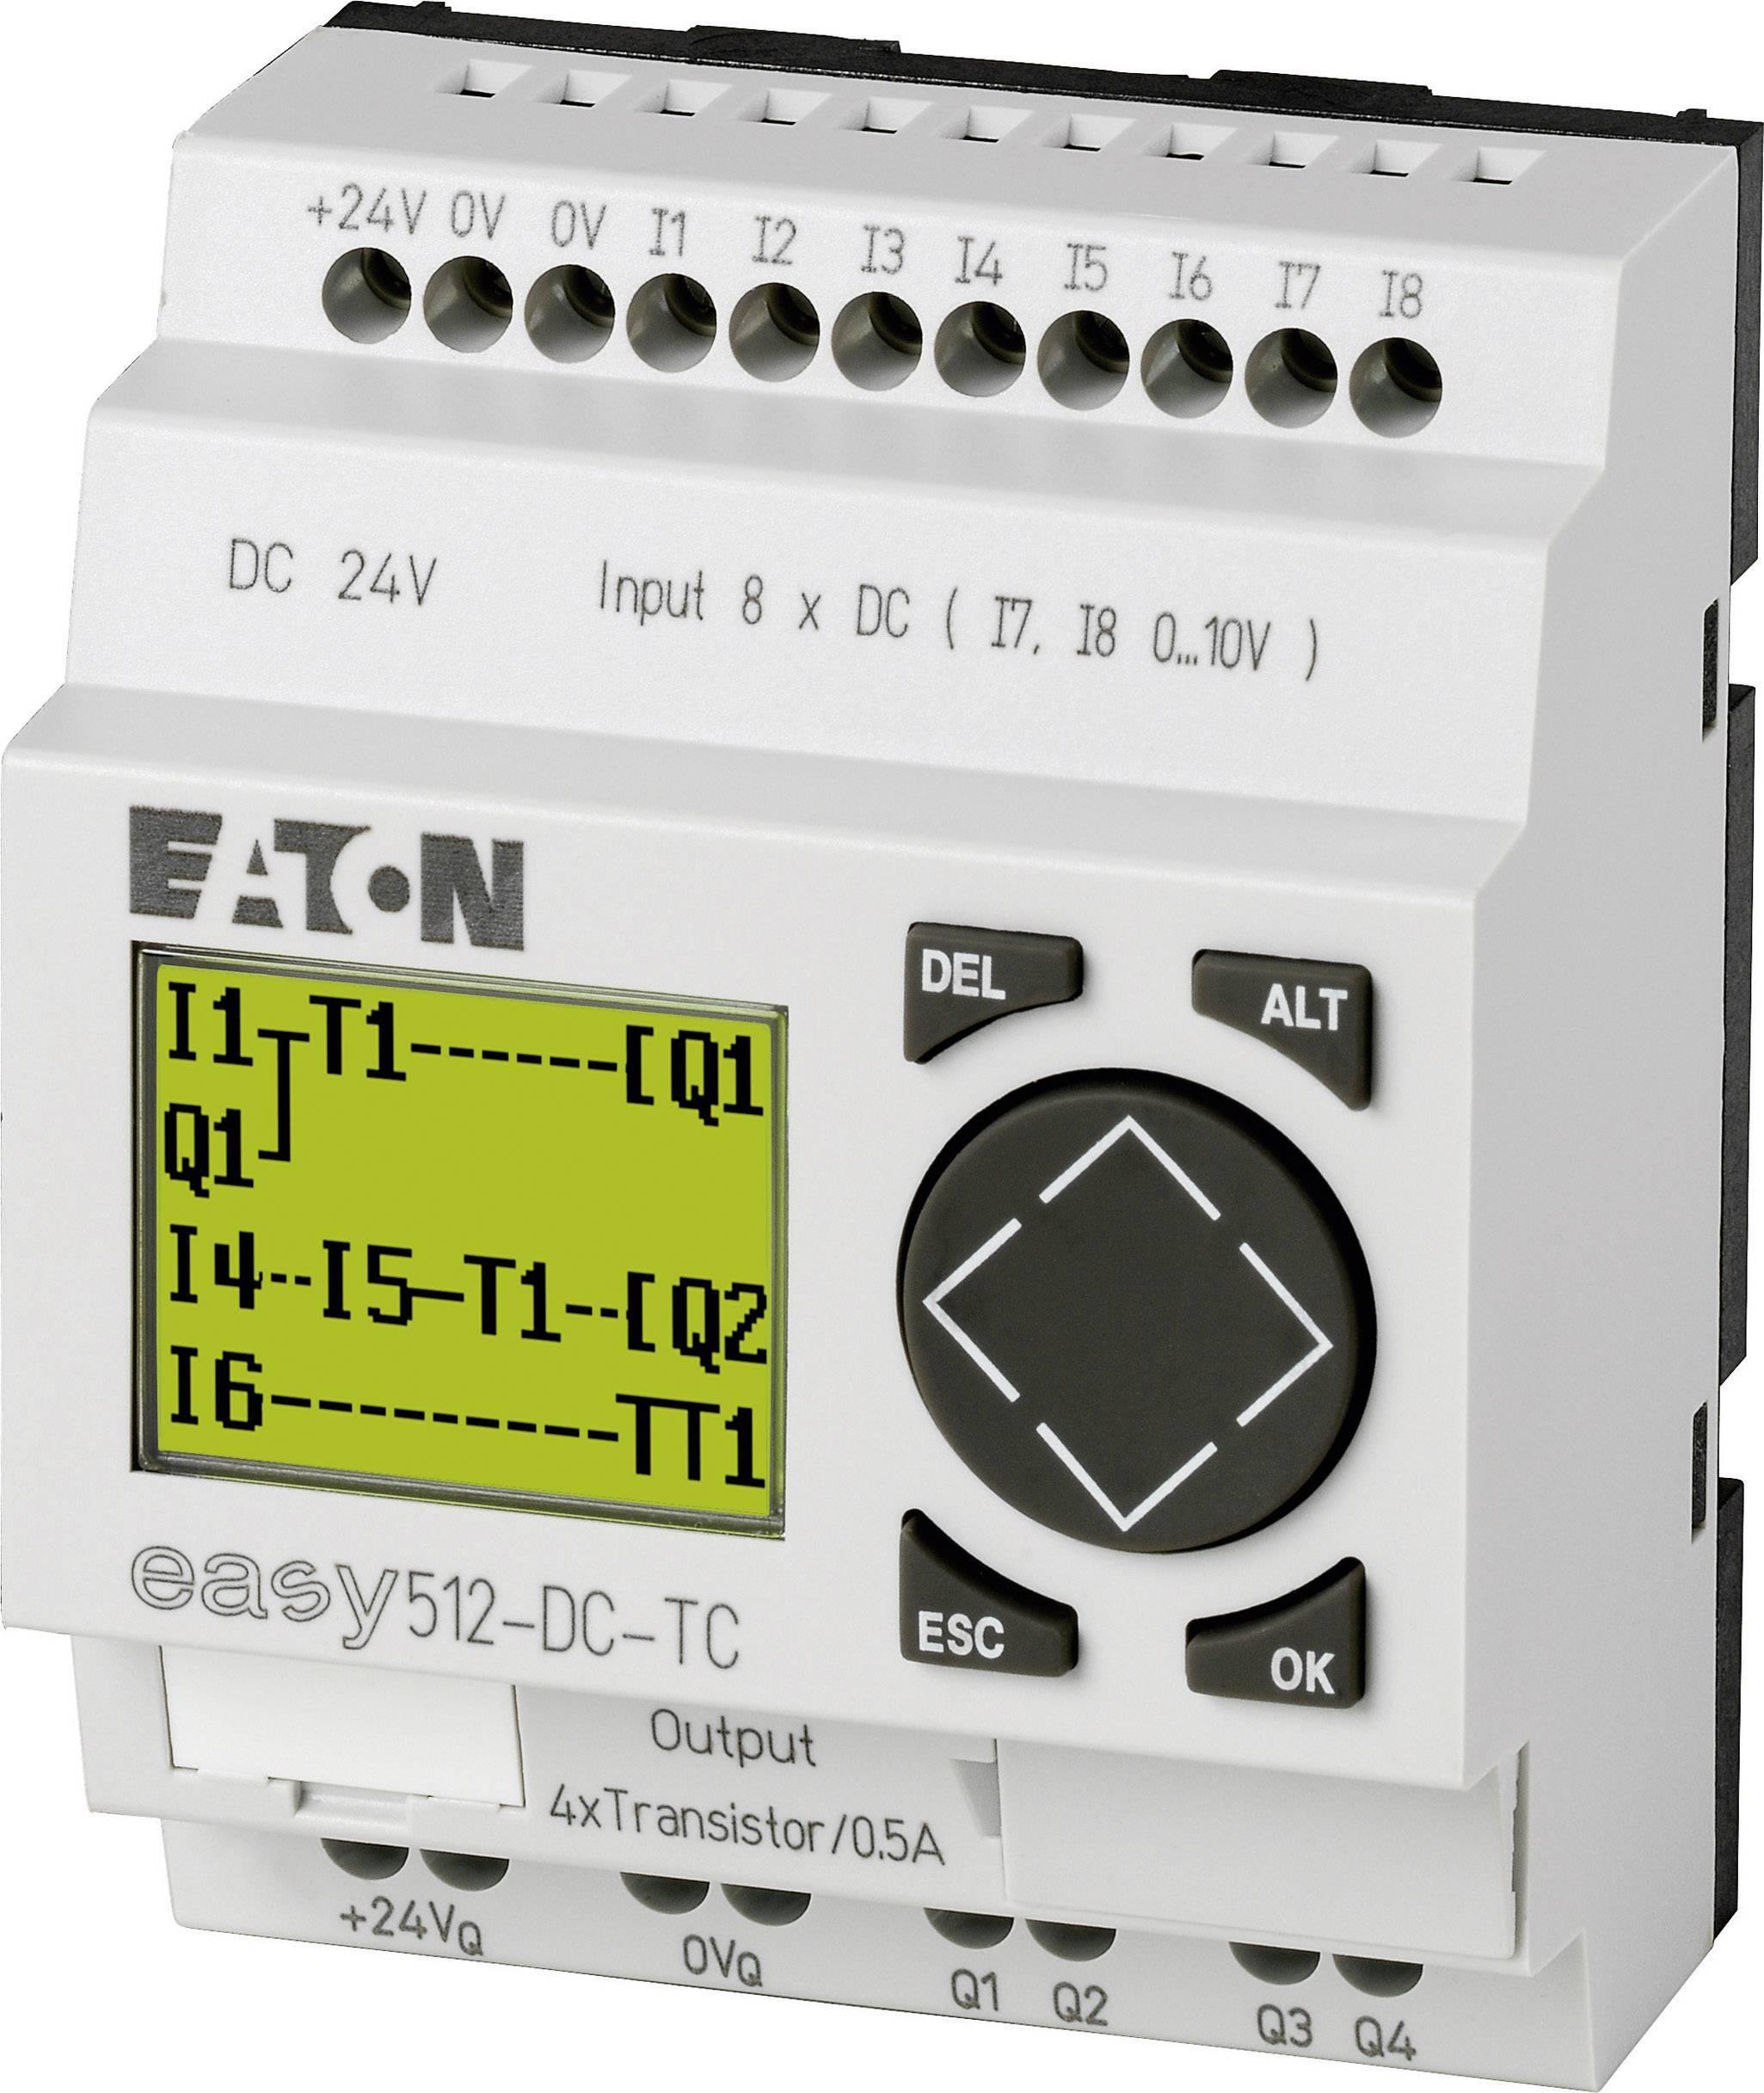 Řídicí reléový modul Eaton easy 512-DC-TC (274111), IP20, 4x tranzistor